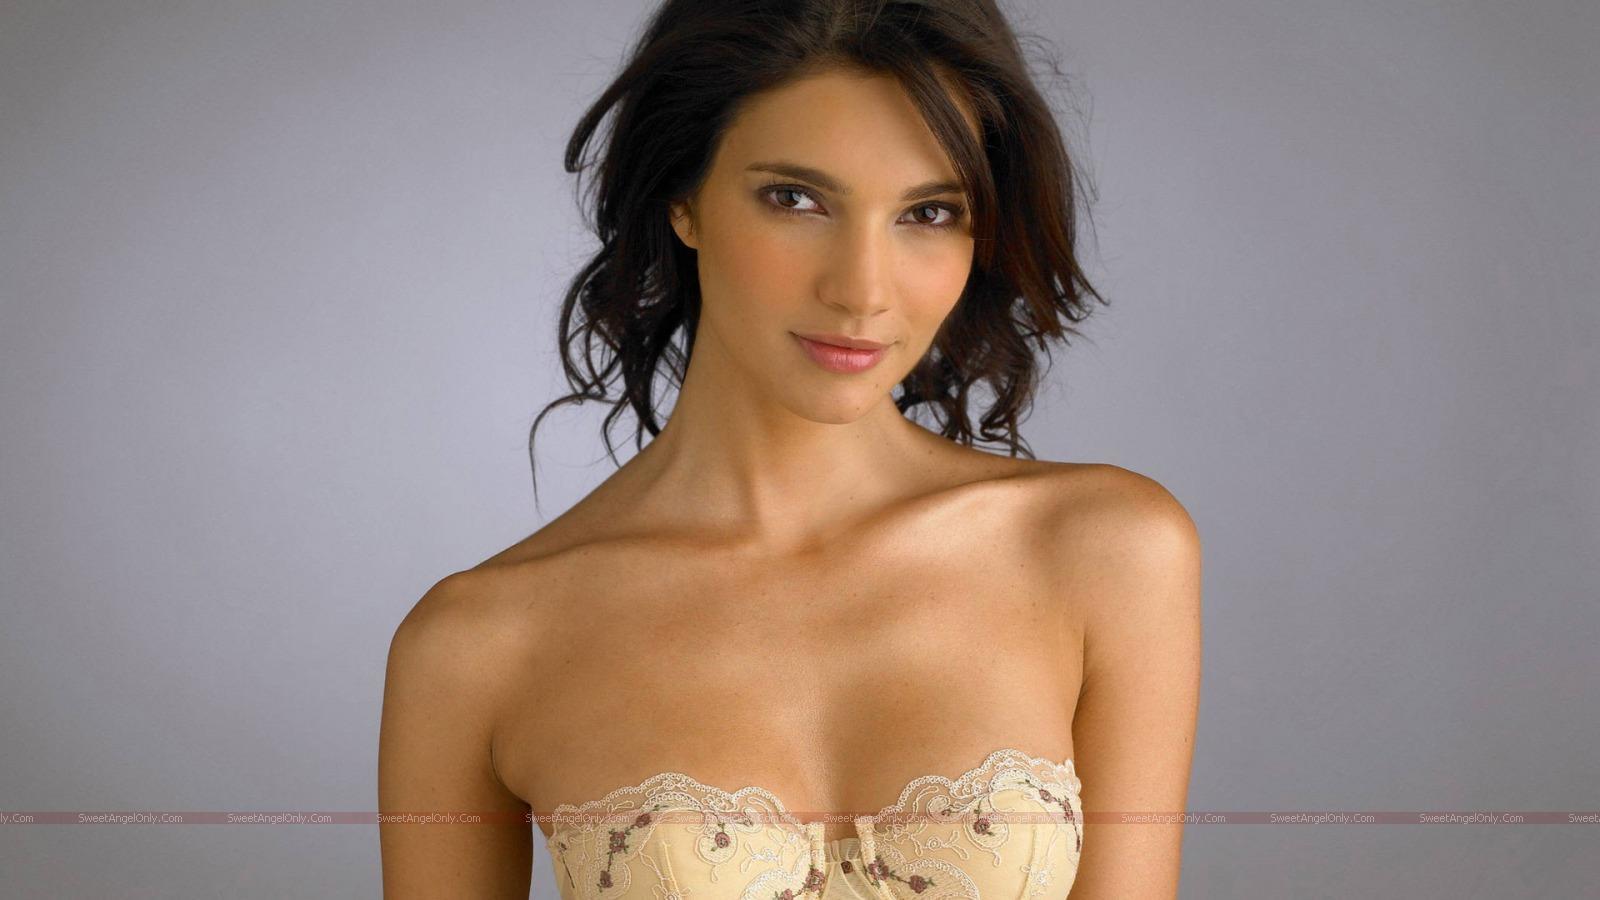 Pic New Posts: Hot Actress Wallpaper